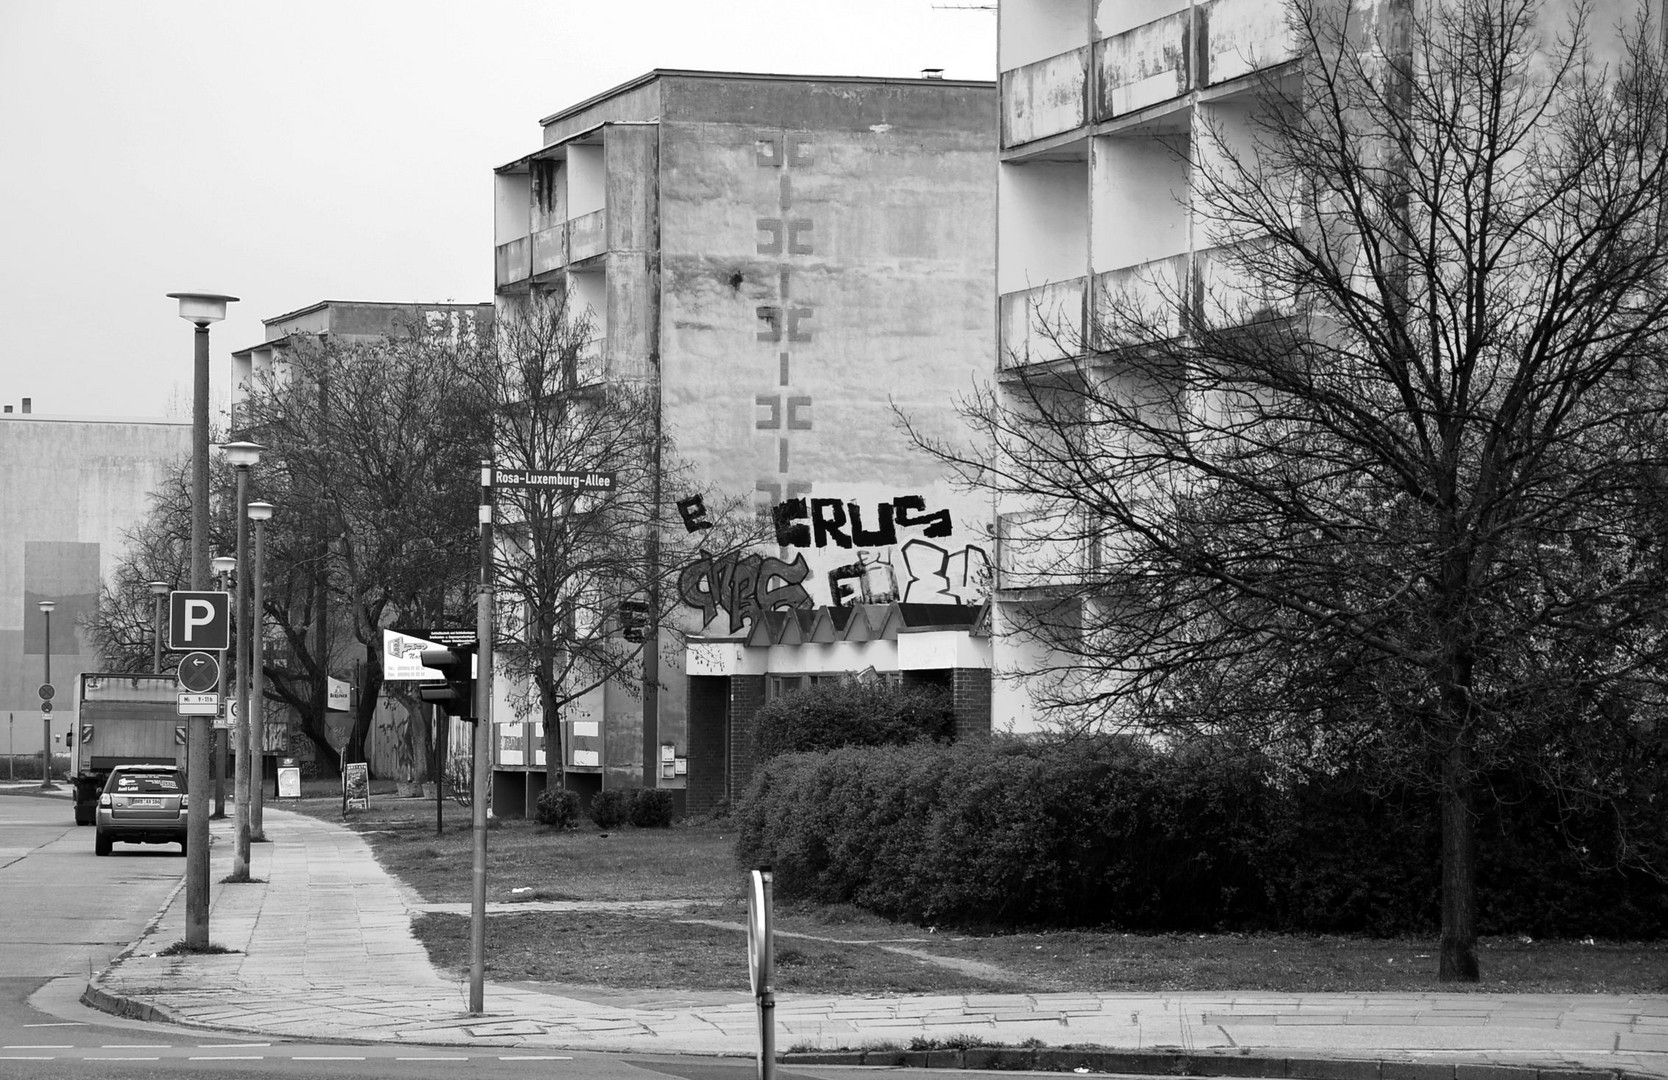 Willkommen in Brandenburg/ Havel I